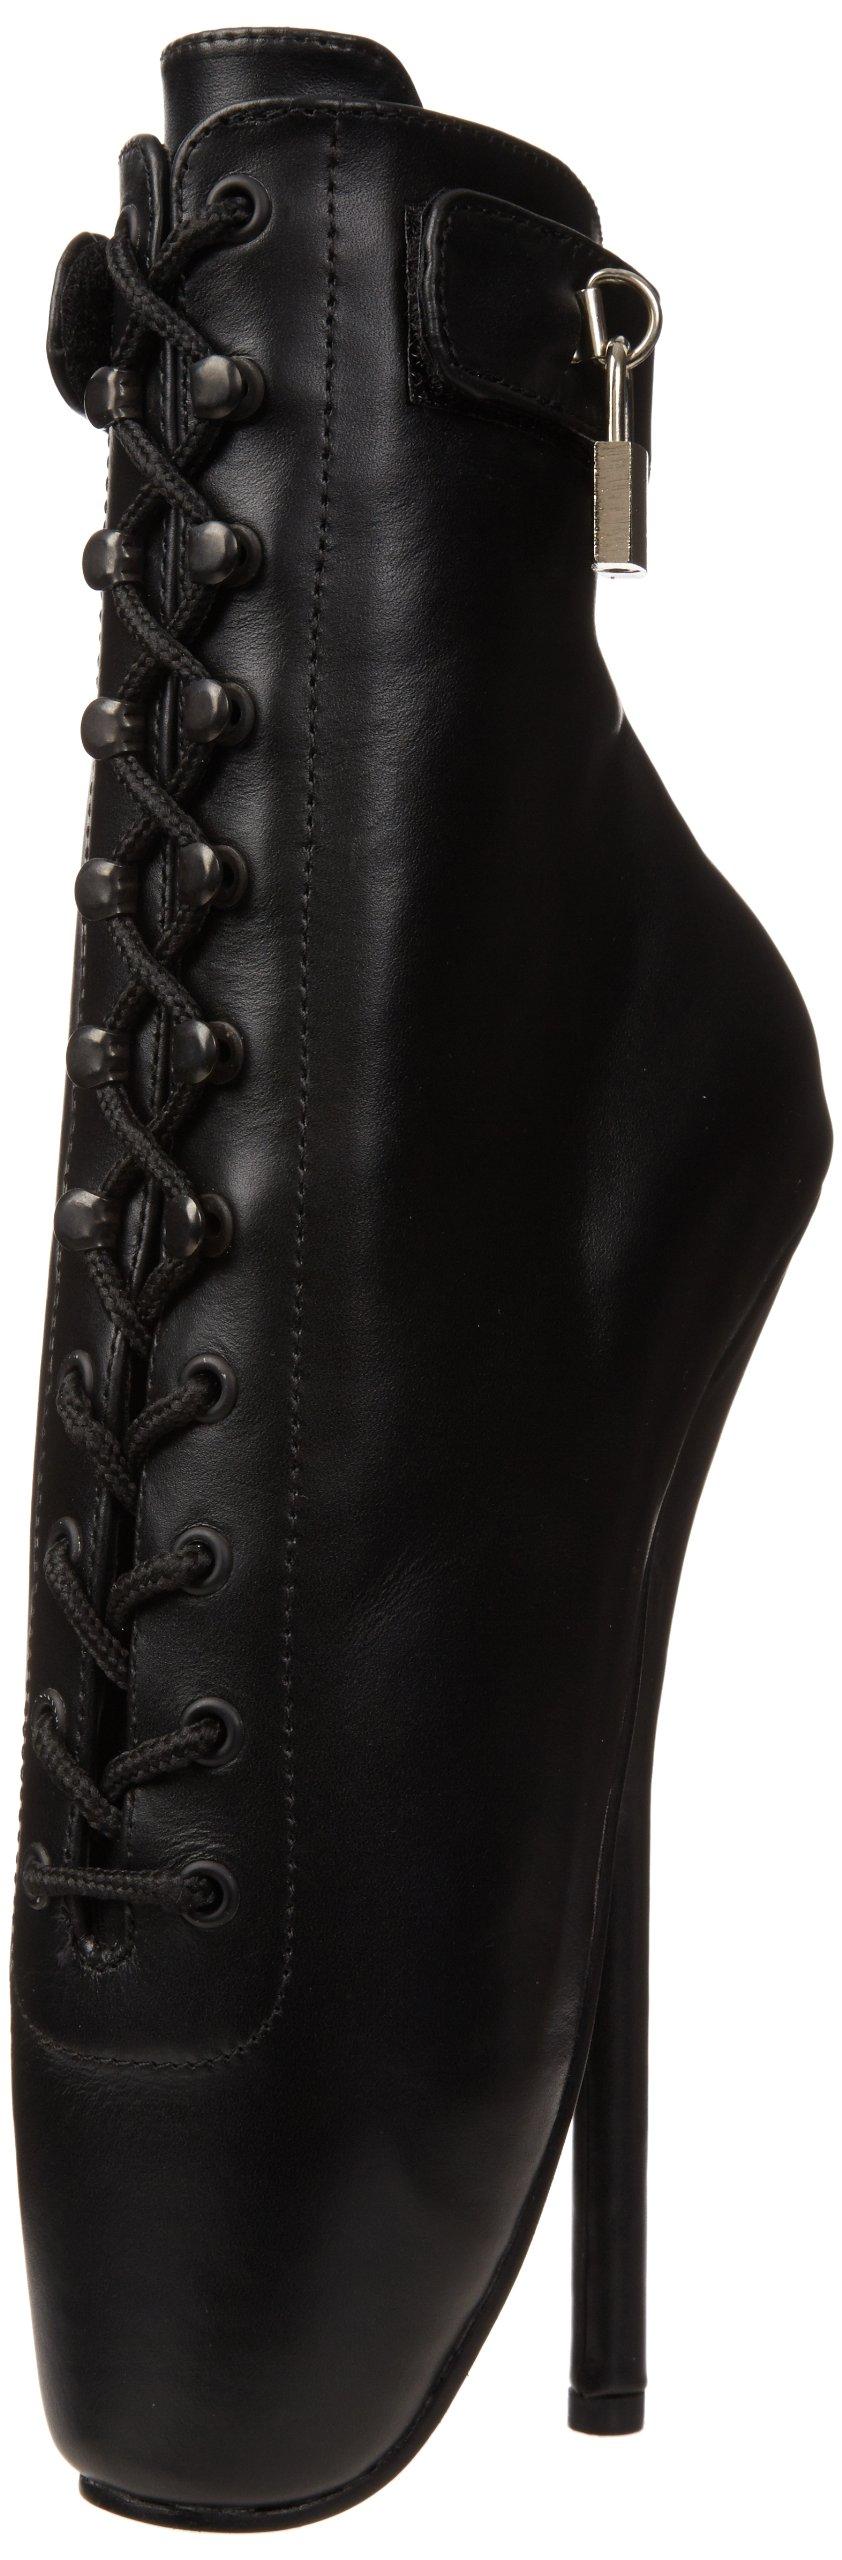 pleaser Women's BALLET-1025/B/LE, Black Leather, 6 M US by pleaser